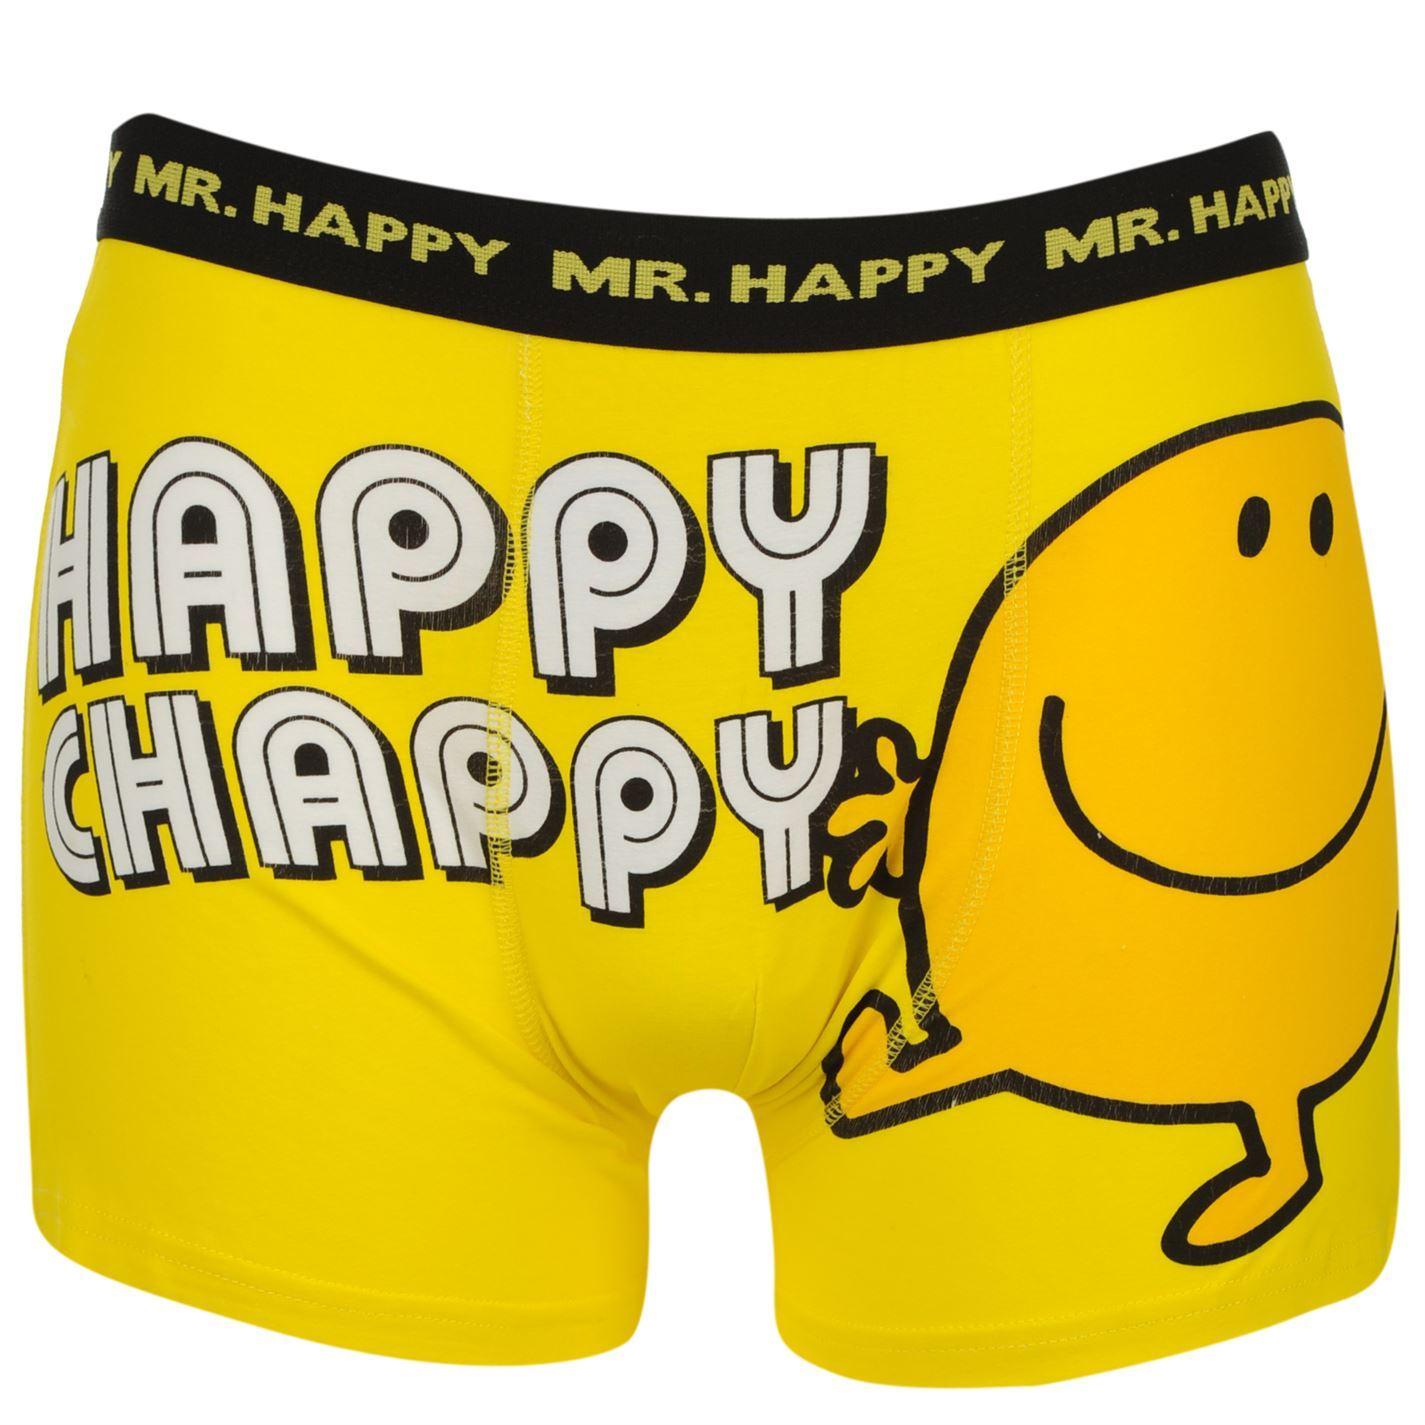 Mr Men Mr Happy Boxer Shorts Mens Yellow/Black Underwear ...